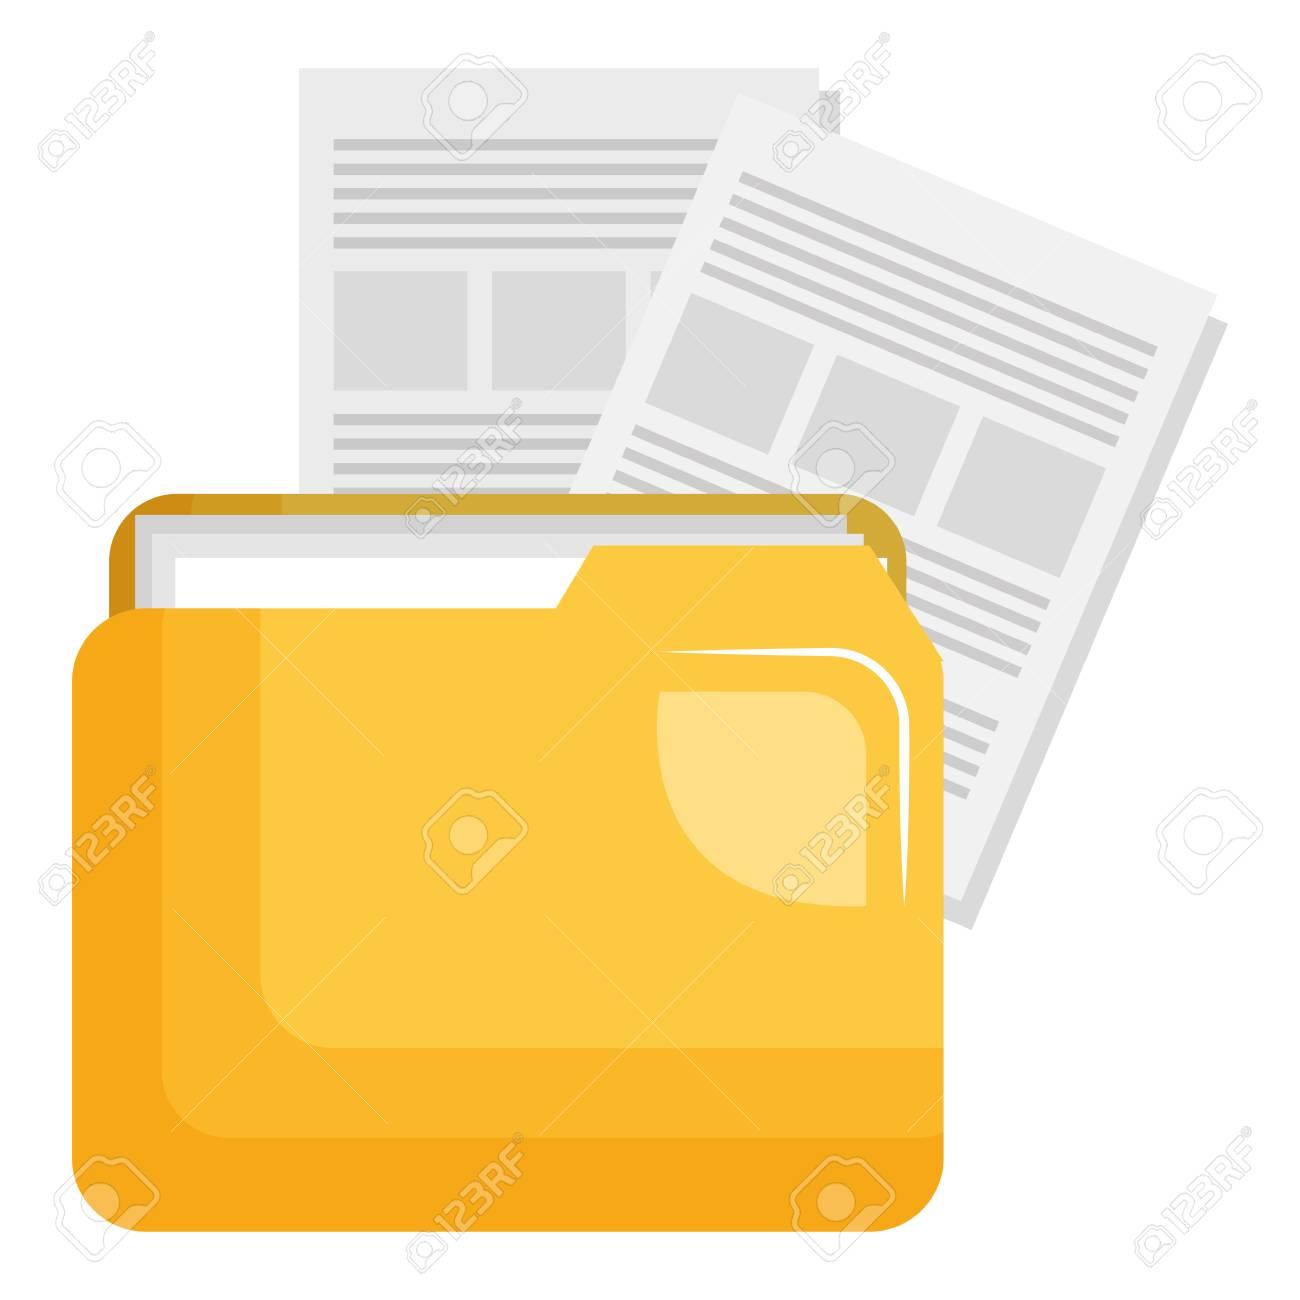 file folder with documents vector illustration design - 110420033